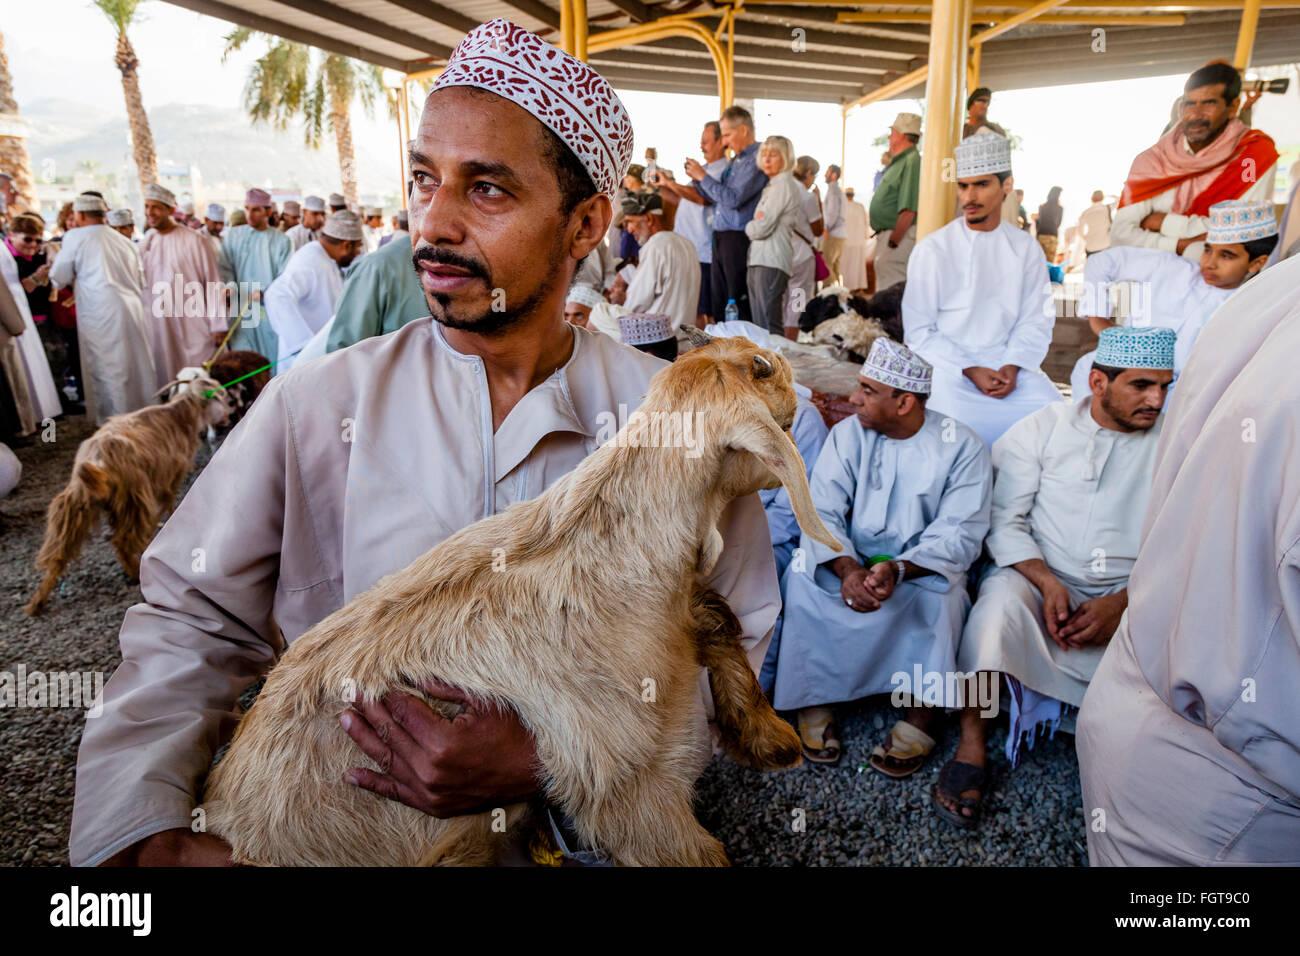 Der Freitag Vieh Markt, Nizwa, Ad Dakhiliyah Region, Oman Stockbild